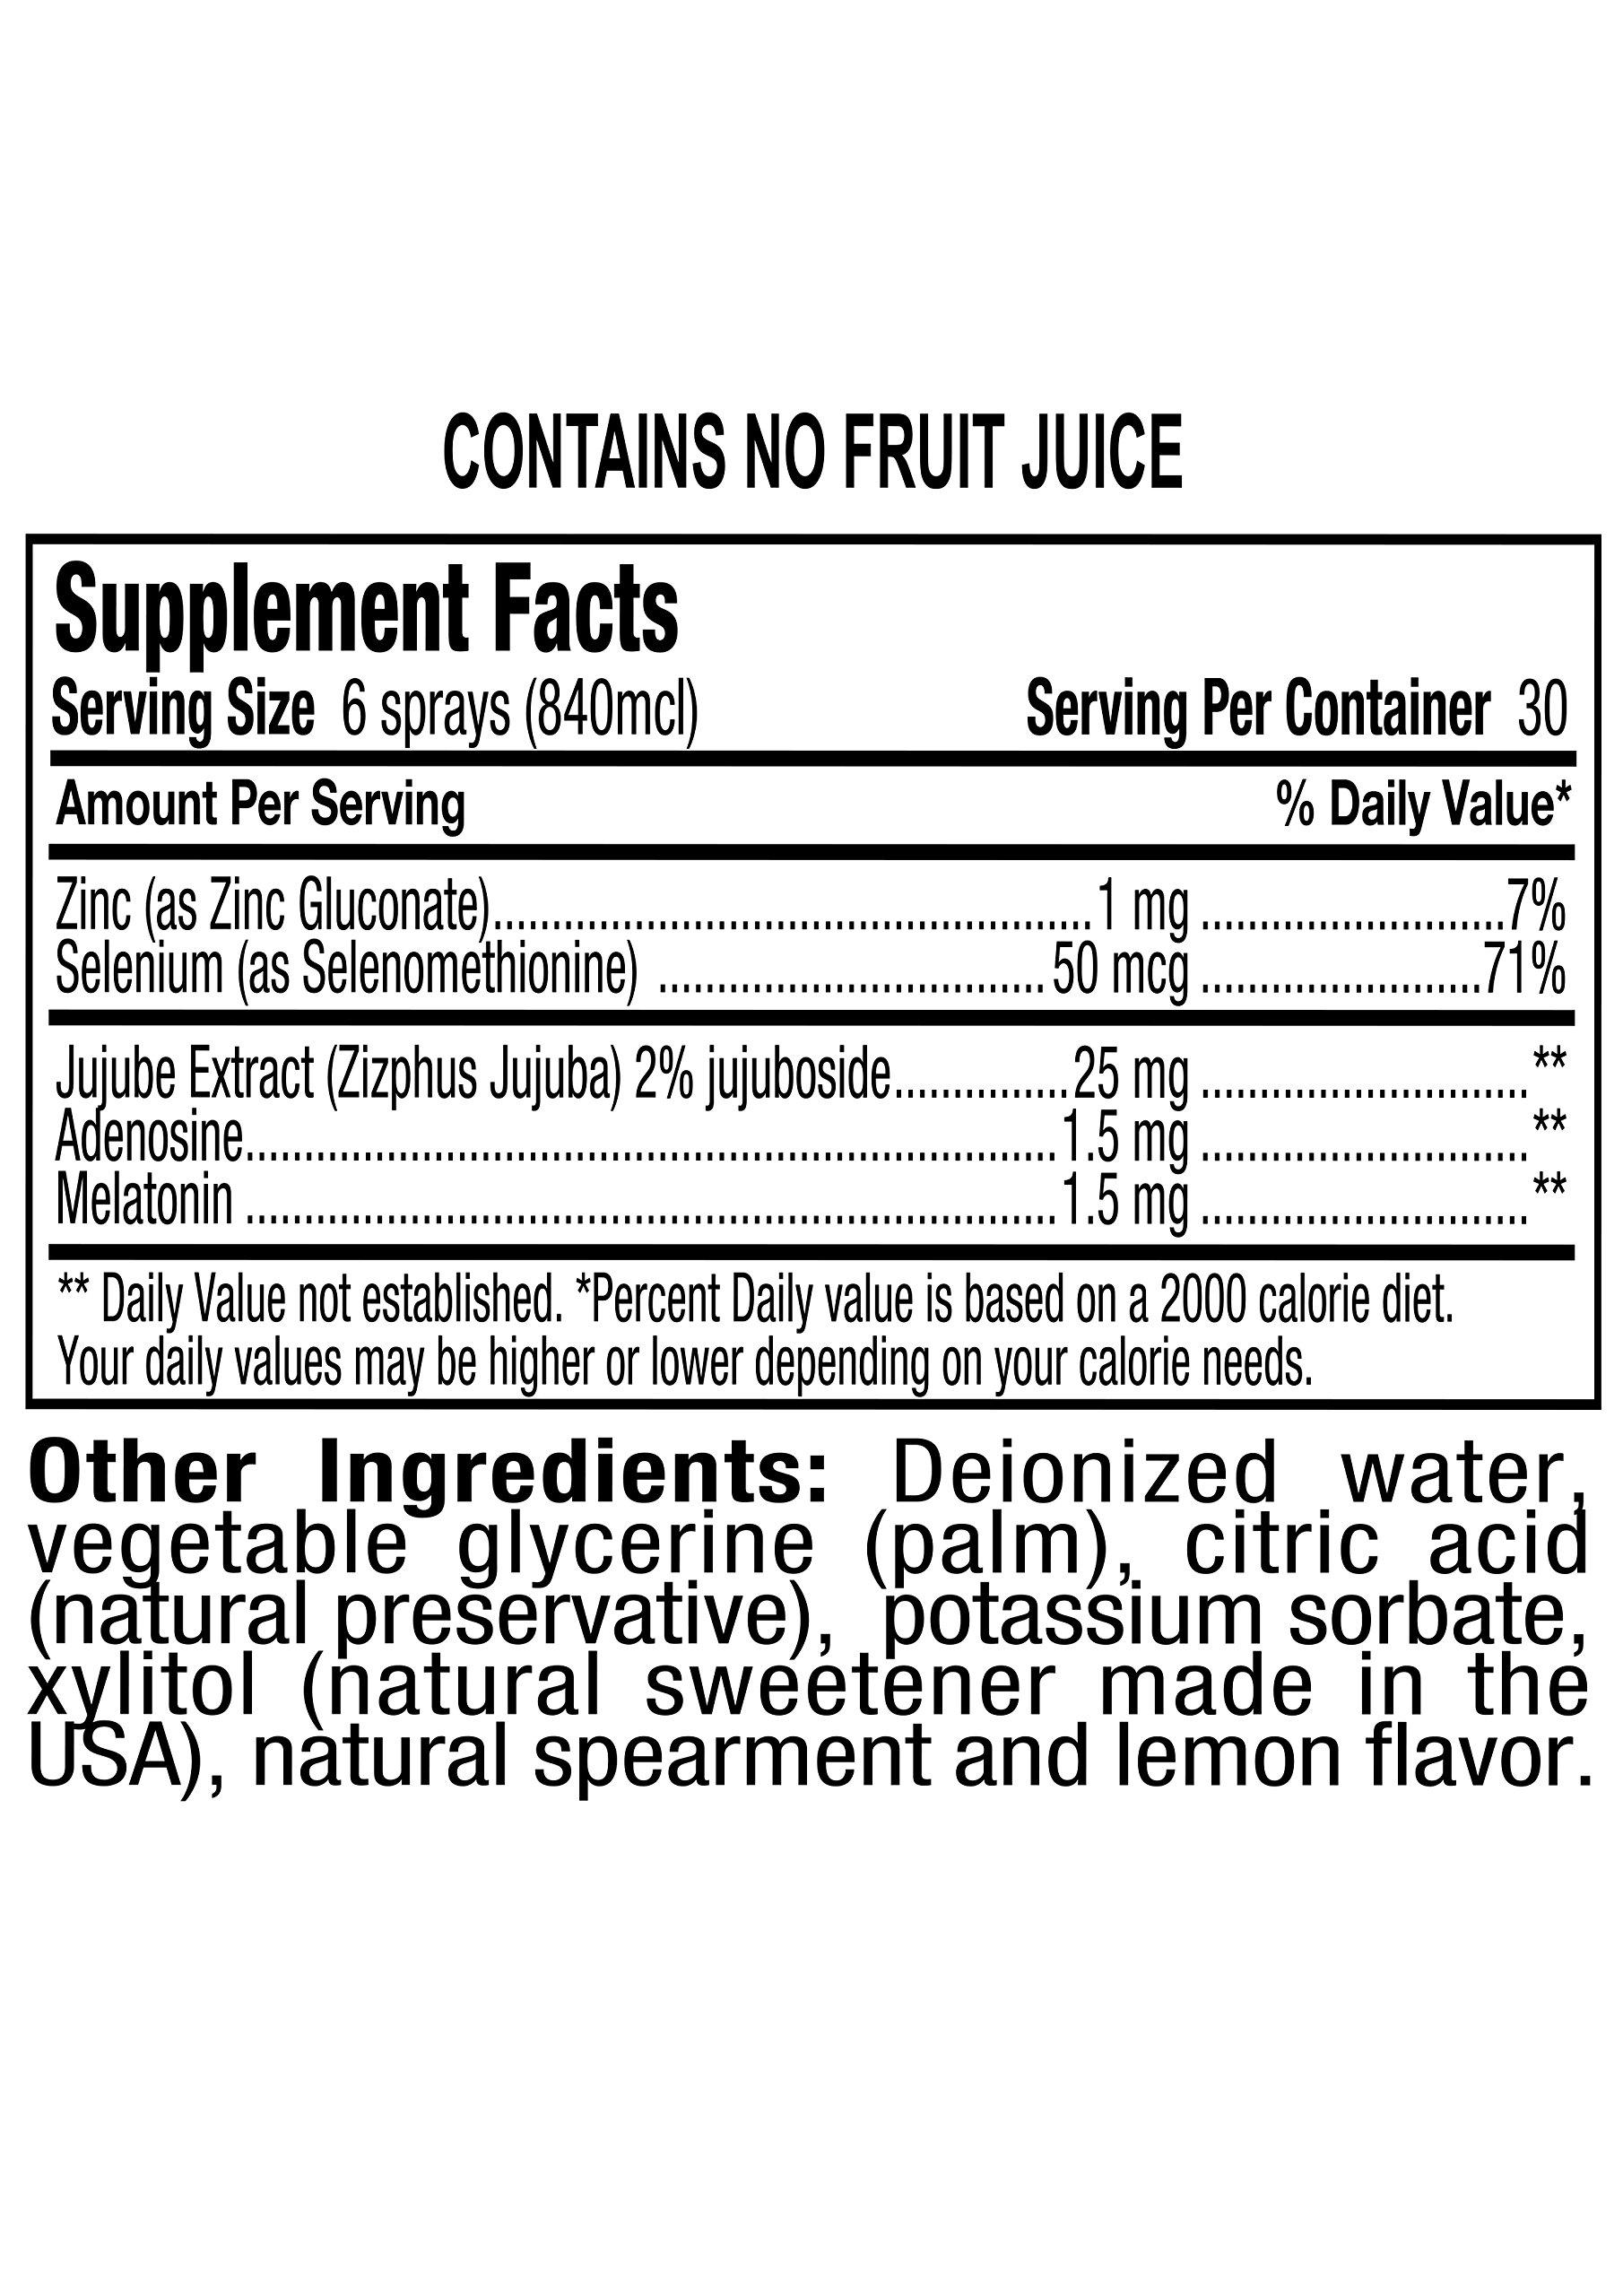 Spray for Life Melatonin Spray with Nanotechnology for Improved Sleep Guaranteed 1oz - Spearmint & Lemon - 30 Day Supply by Spray For Life (Image #3)